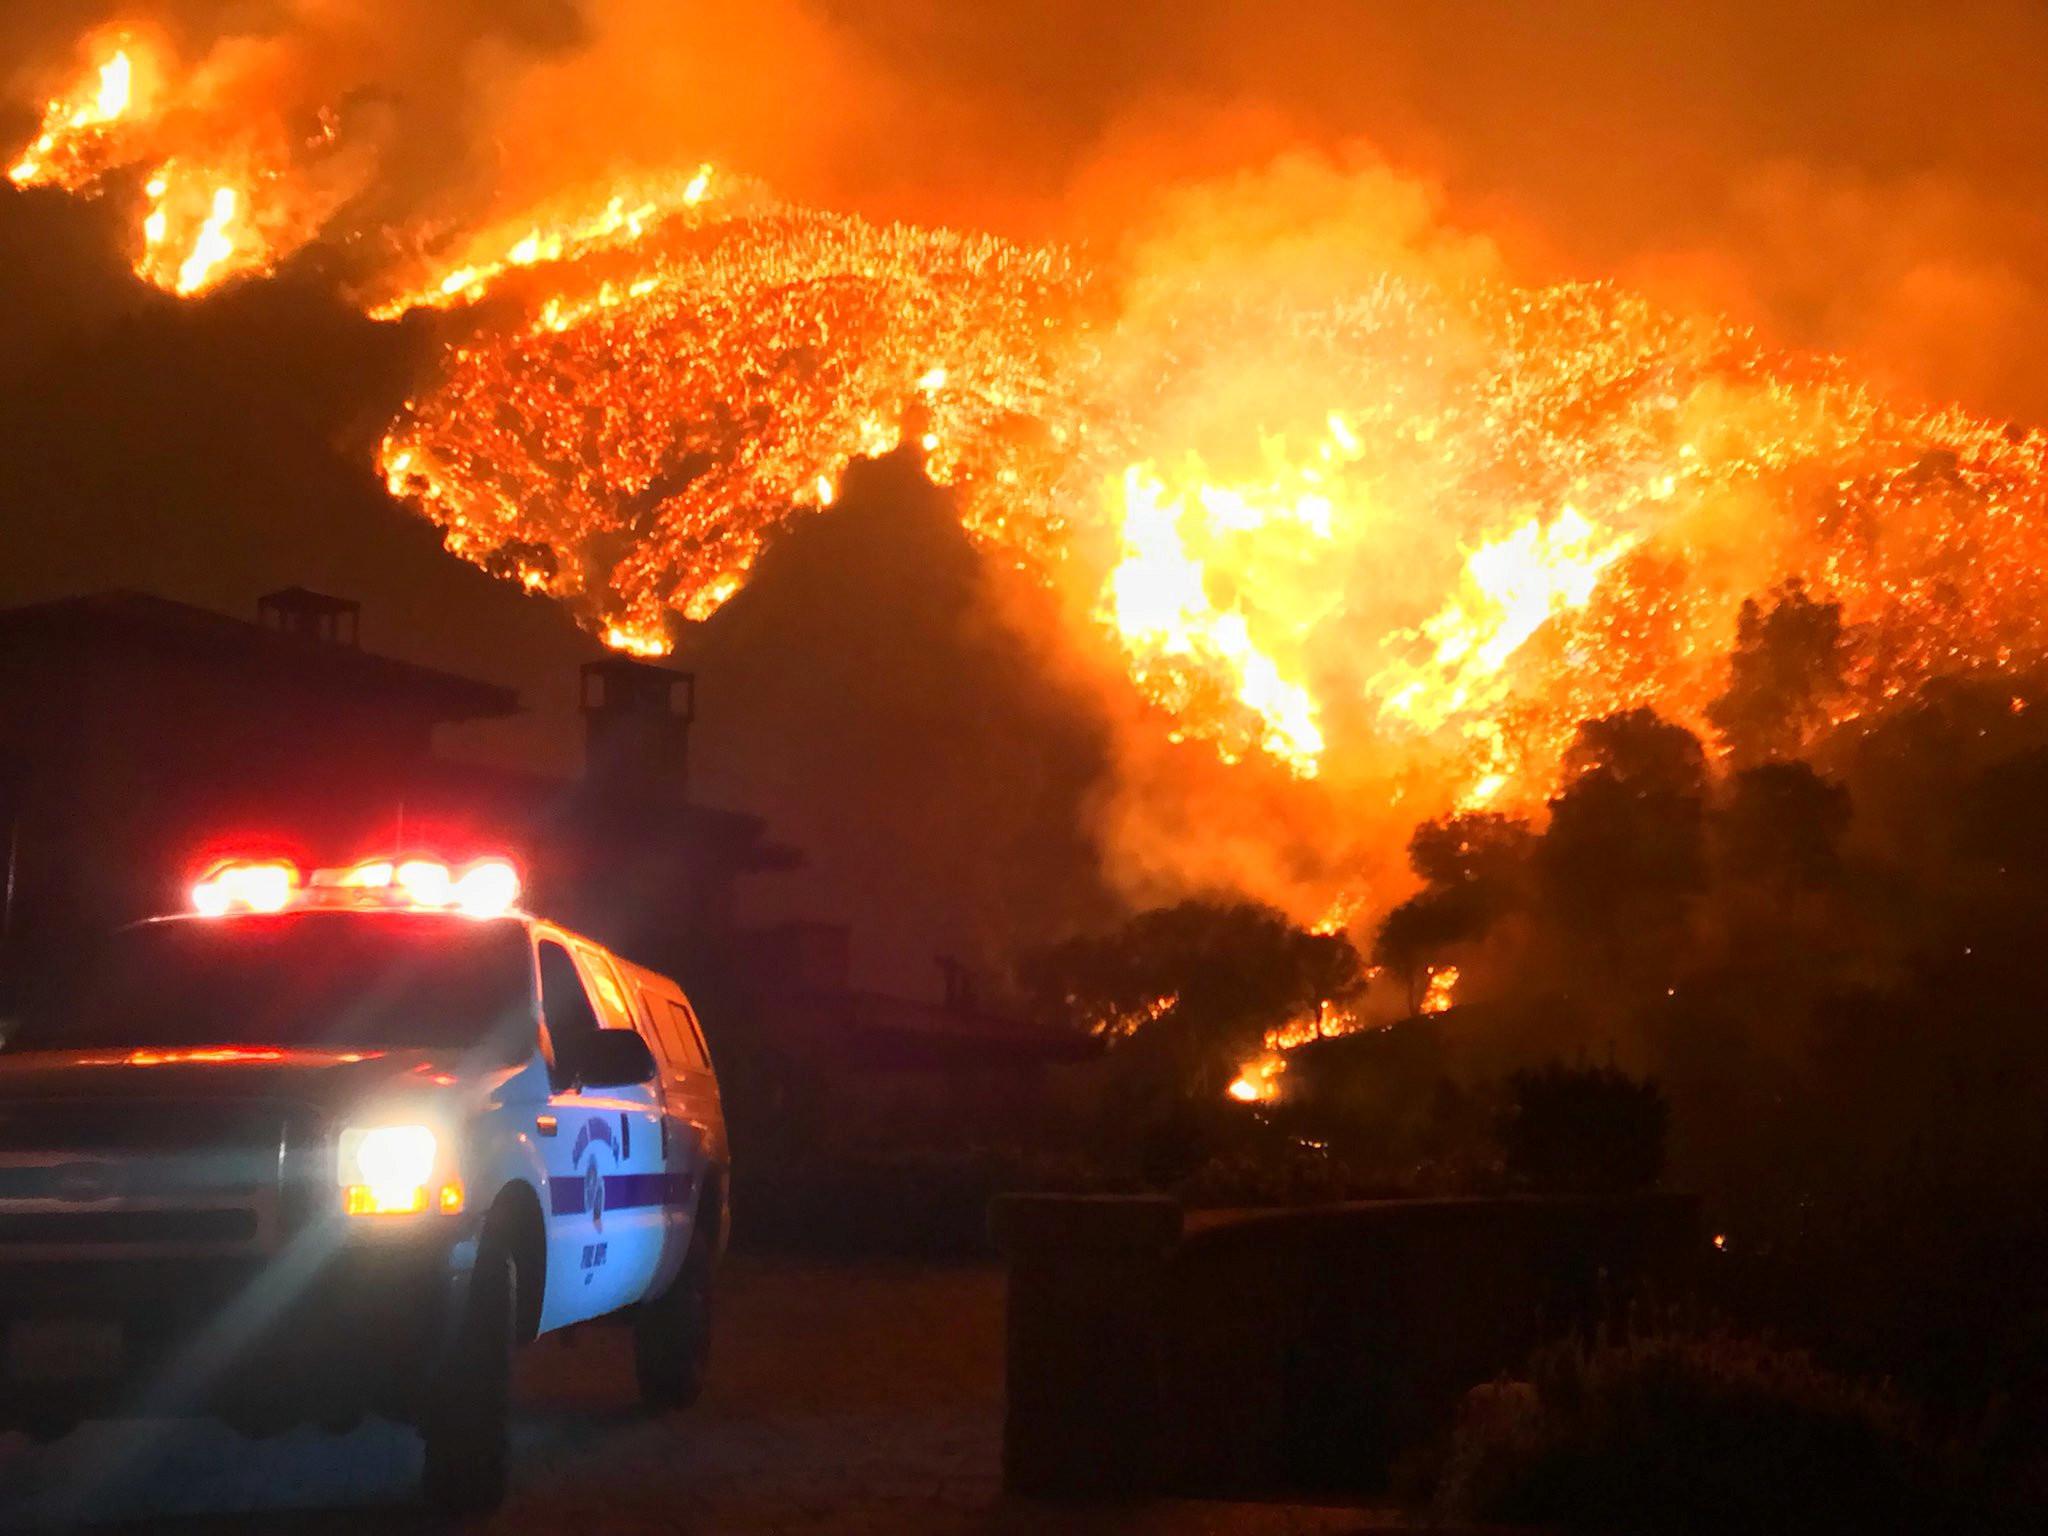 Фото © Courtesy Mike Eliason/Santa Barbara County Fire Department/Handout via REUTERS